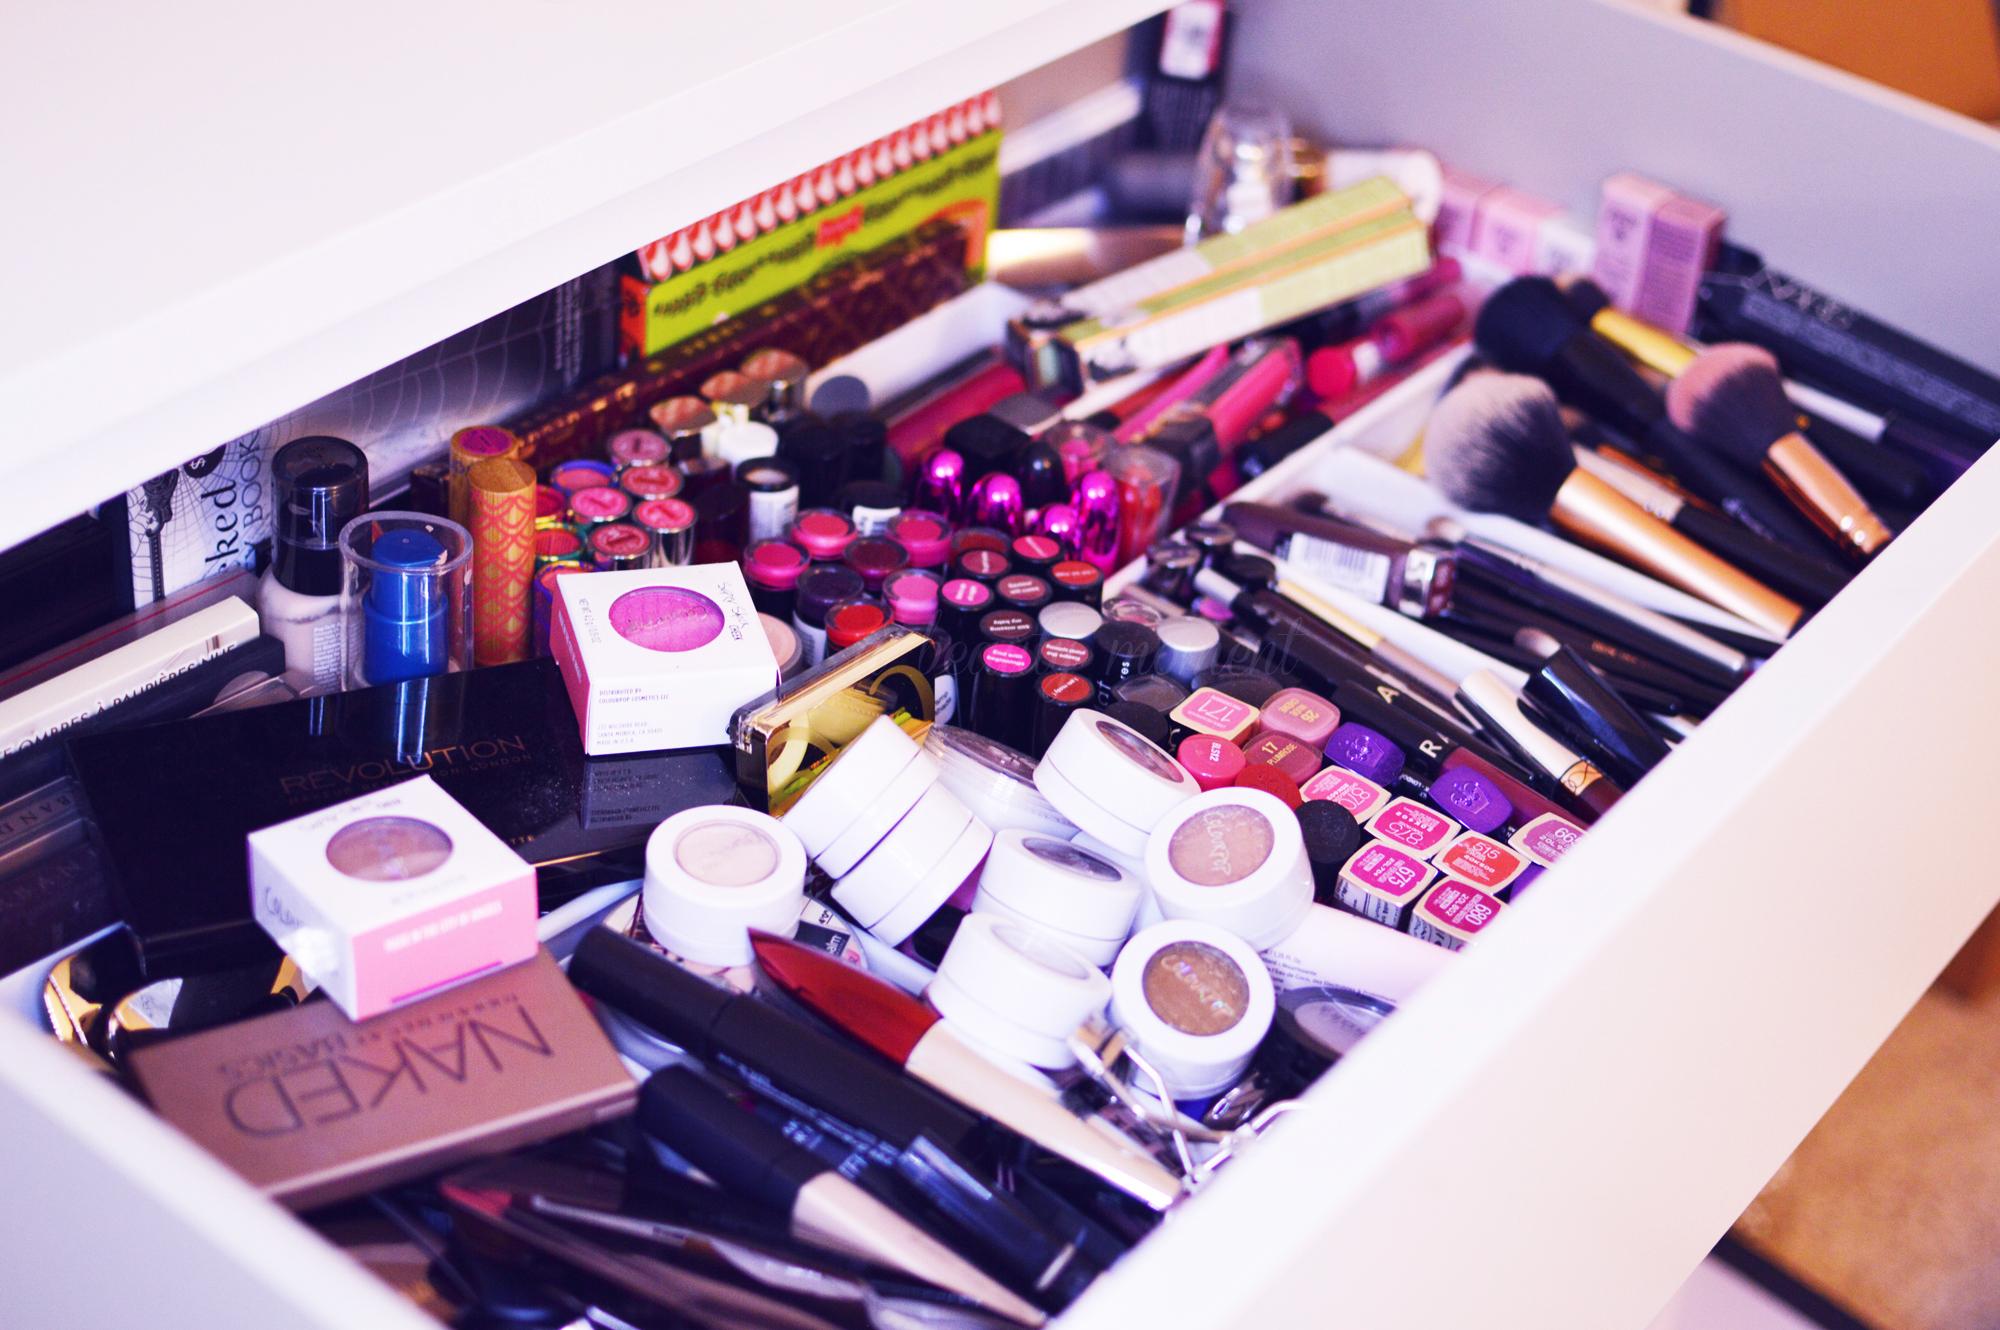 Makeup Tips - Building a Makeup Collection on a Budget - My Makeup Collection